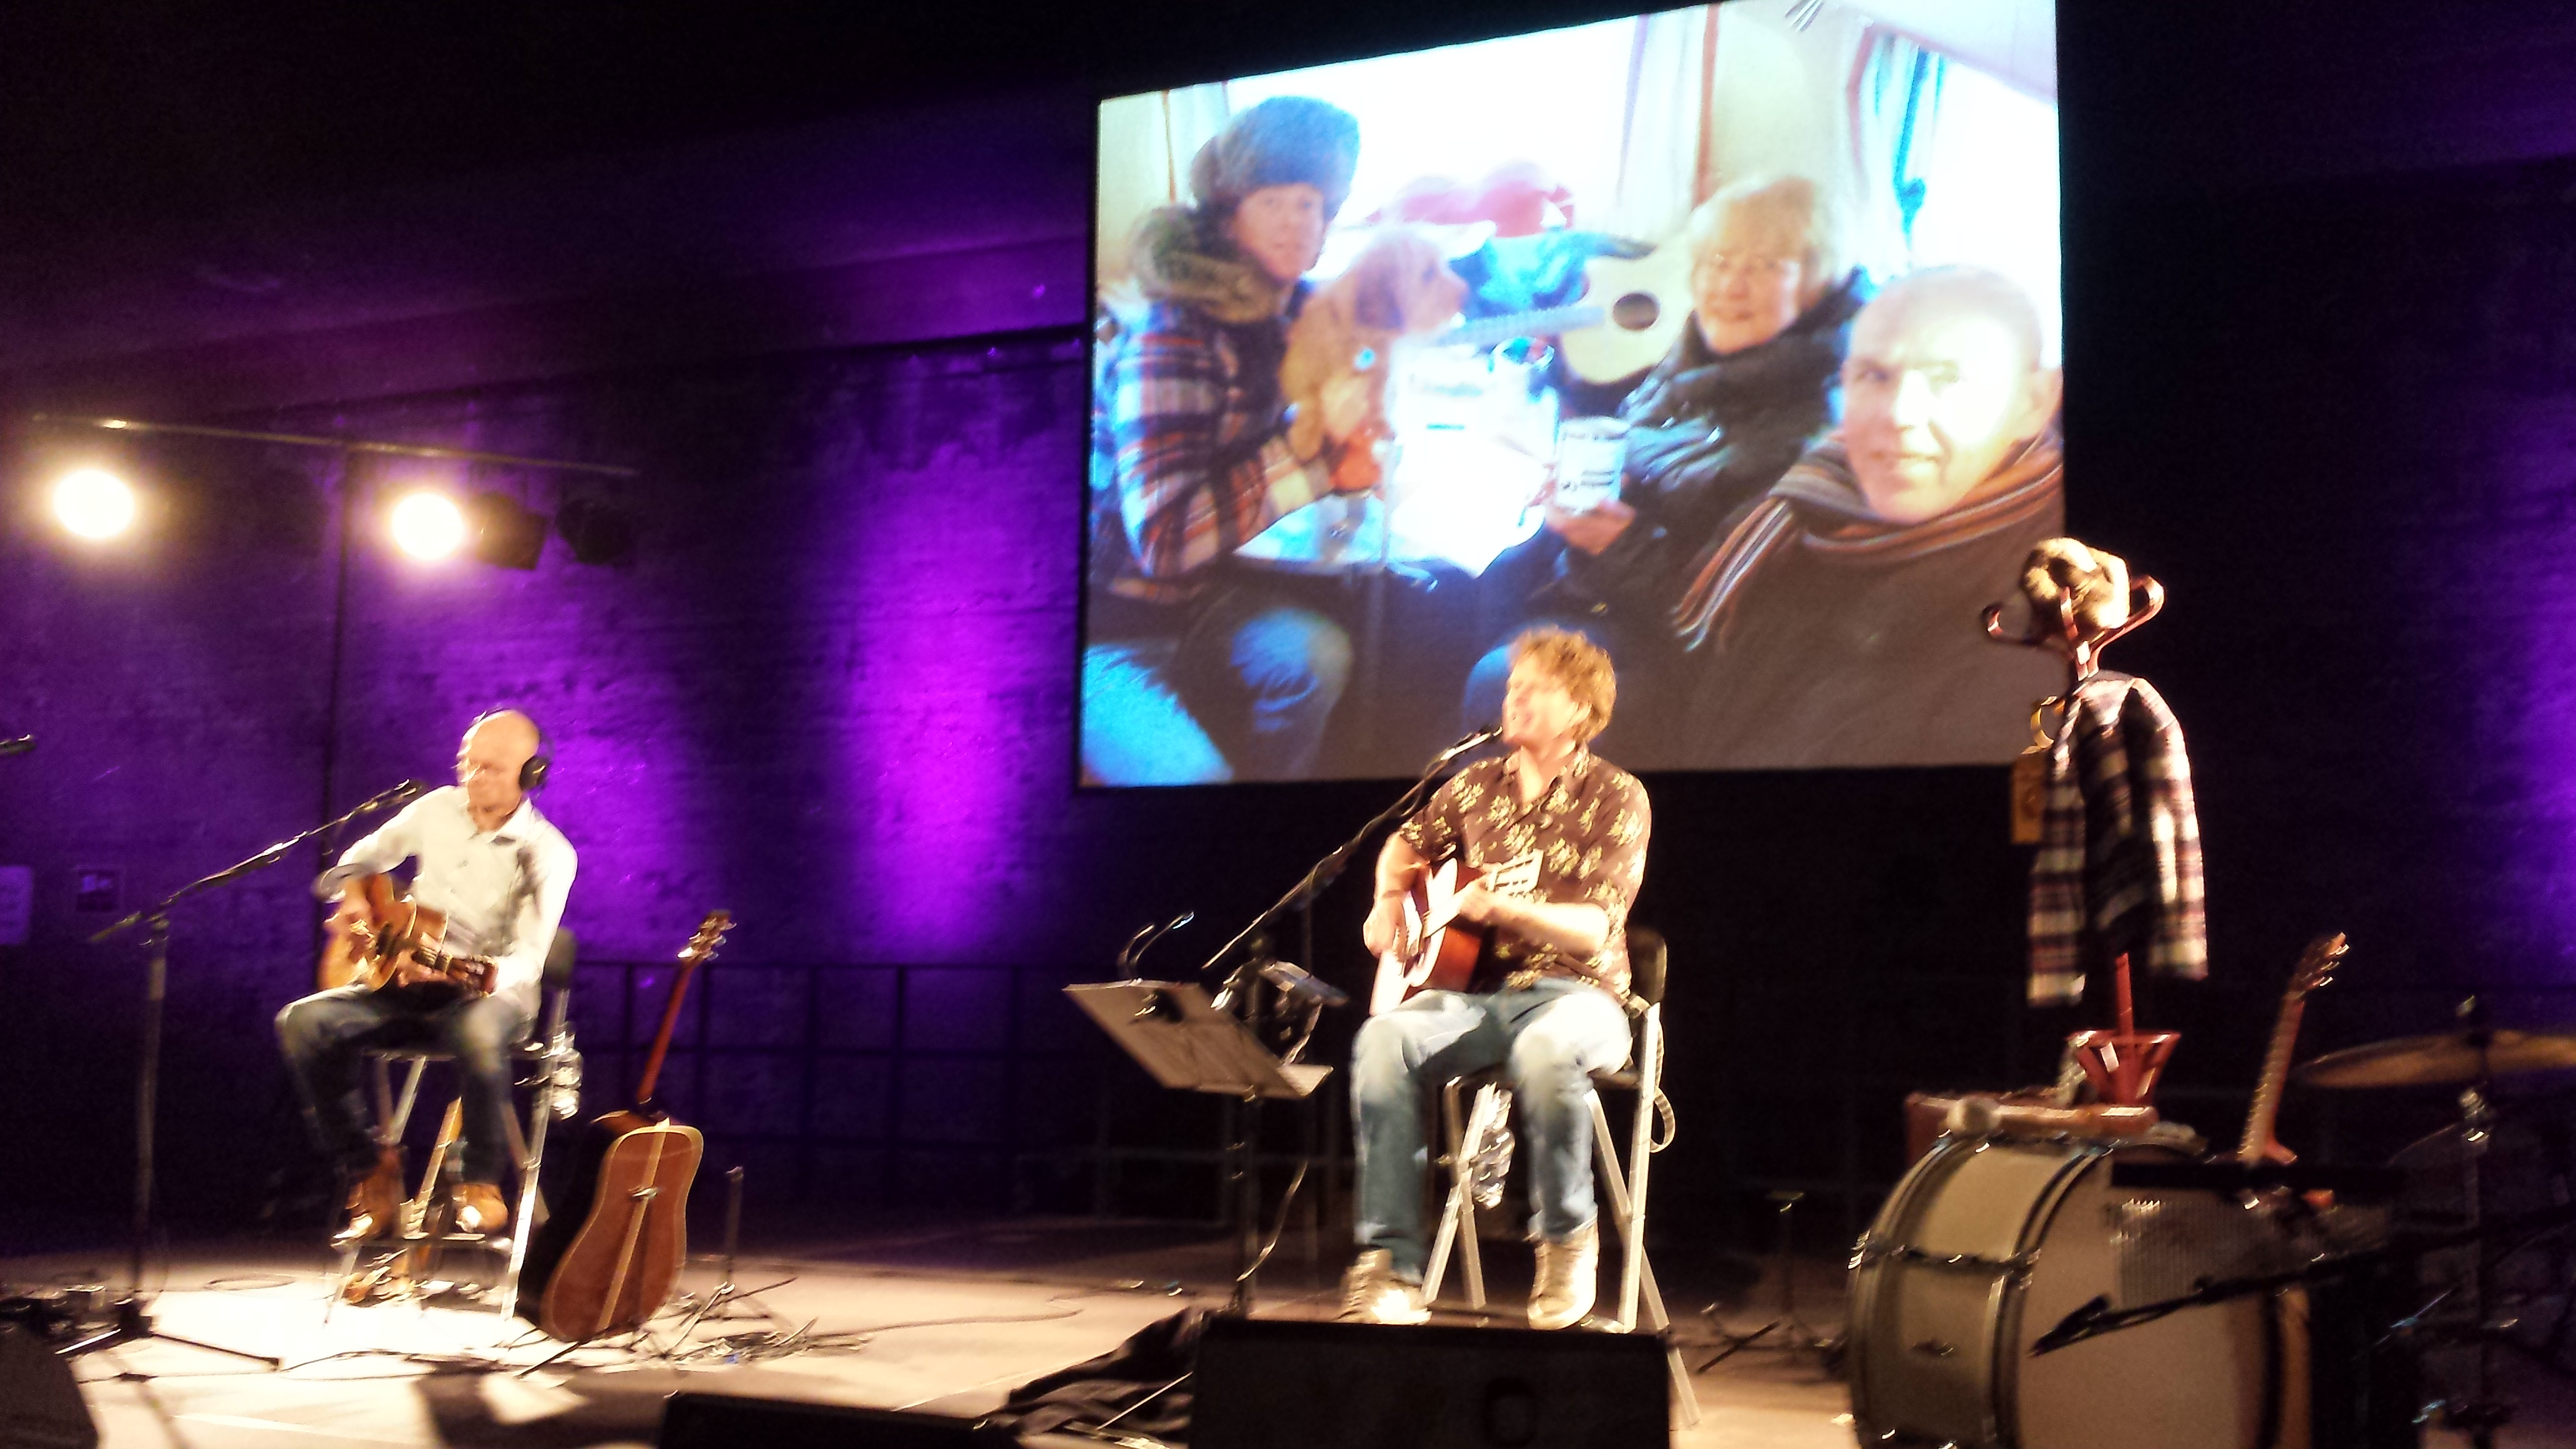 Tjerk Ridder (links), musikalisch begleitet von Mattijs Spek (links)